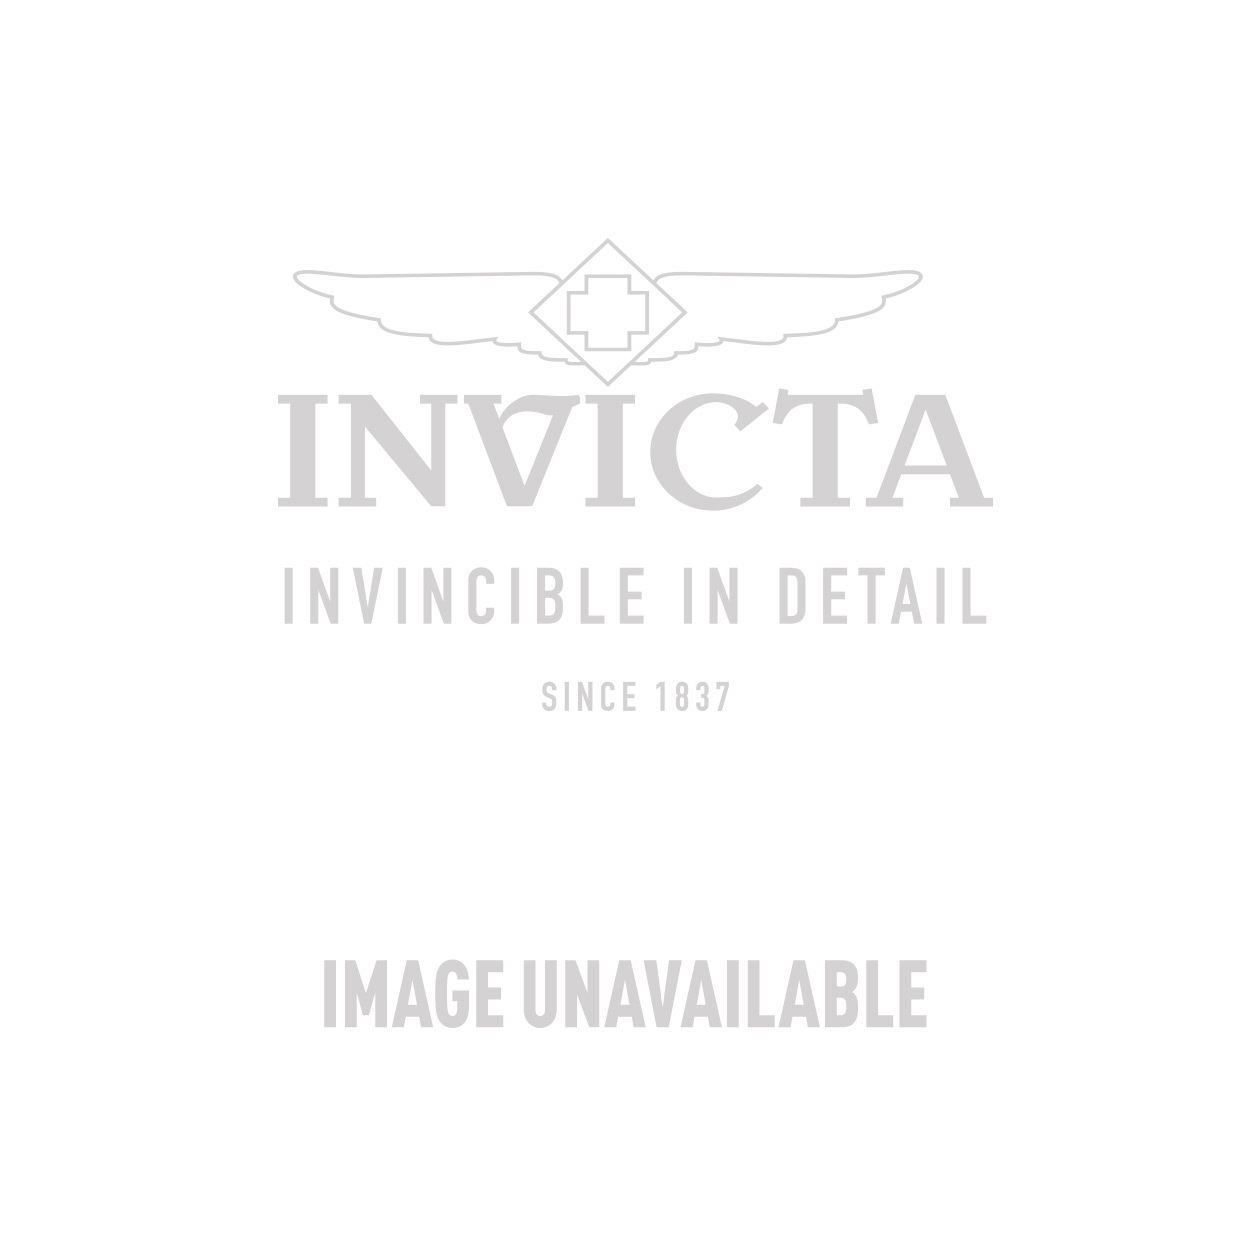 Invicta Corduba Swiss Movement Quartz Watch - Stainless Steel case with Steel, Black tone Stainless Steel, Polyurethane band - Model 19232